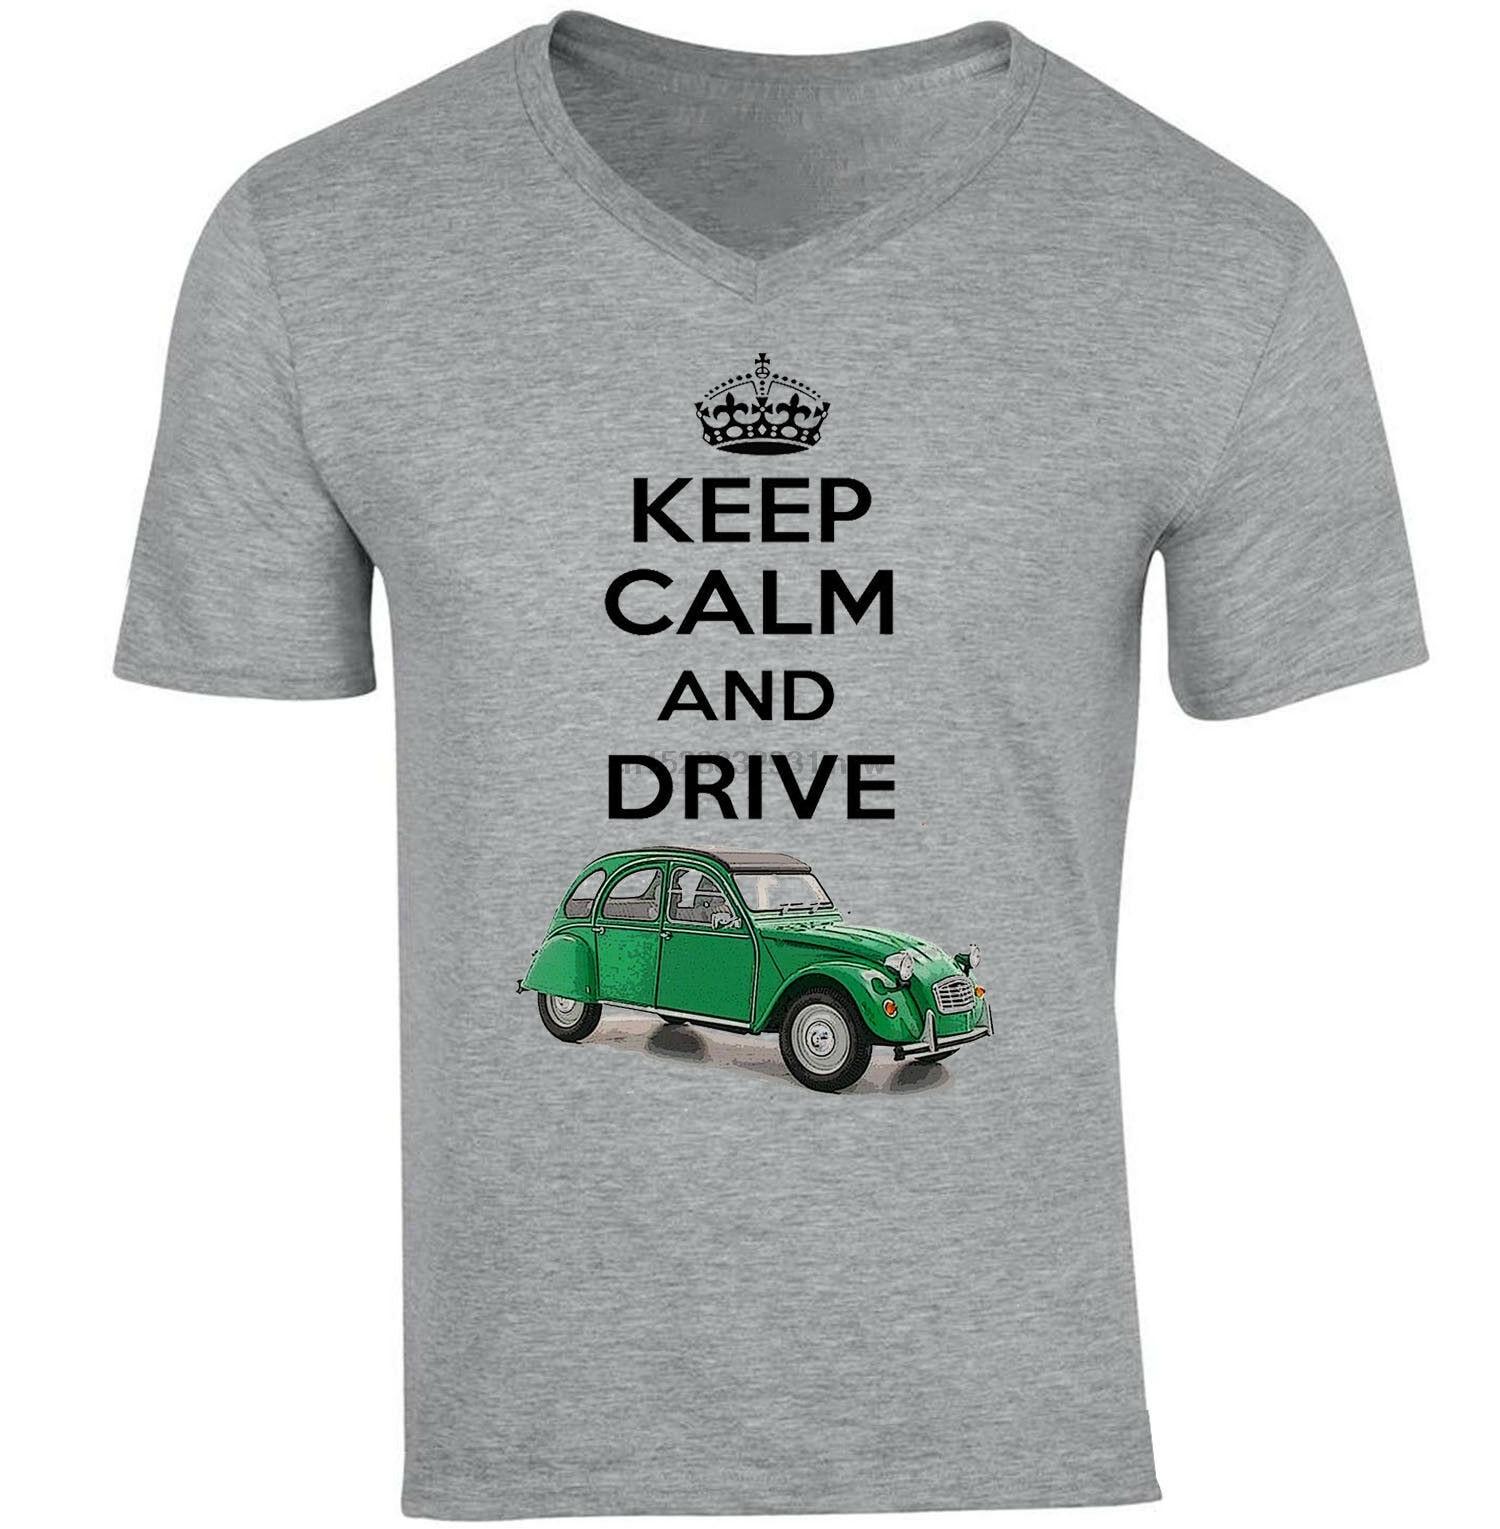 French Car 2Cv 1948 Keep Calm - New Cotton Grey Tshirt